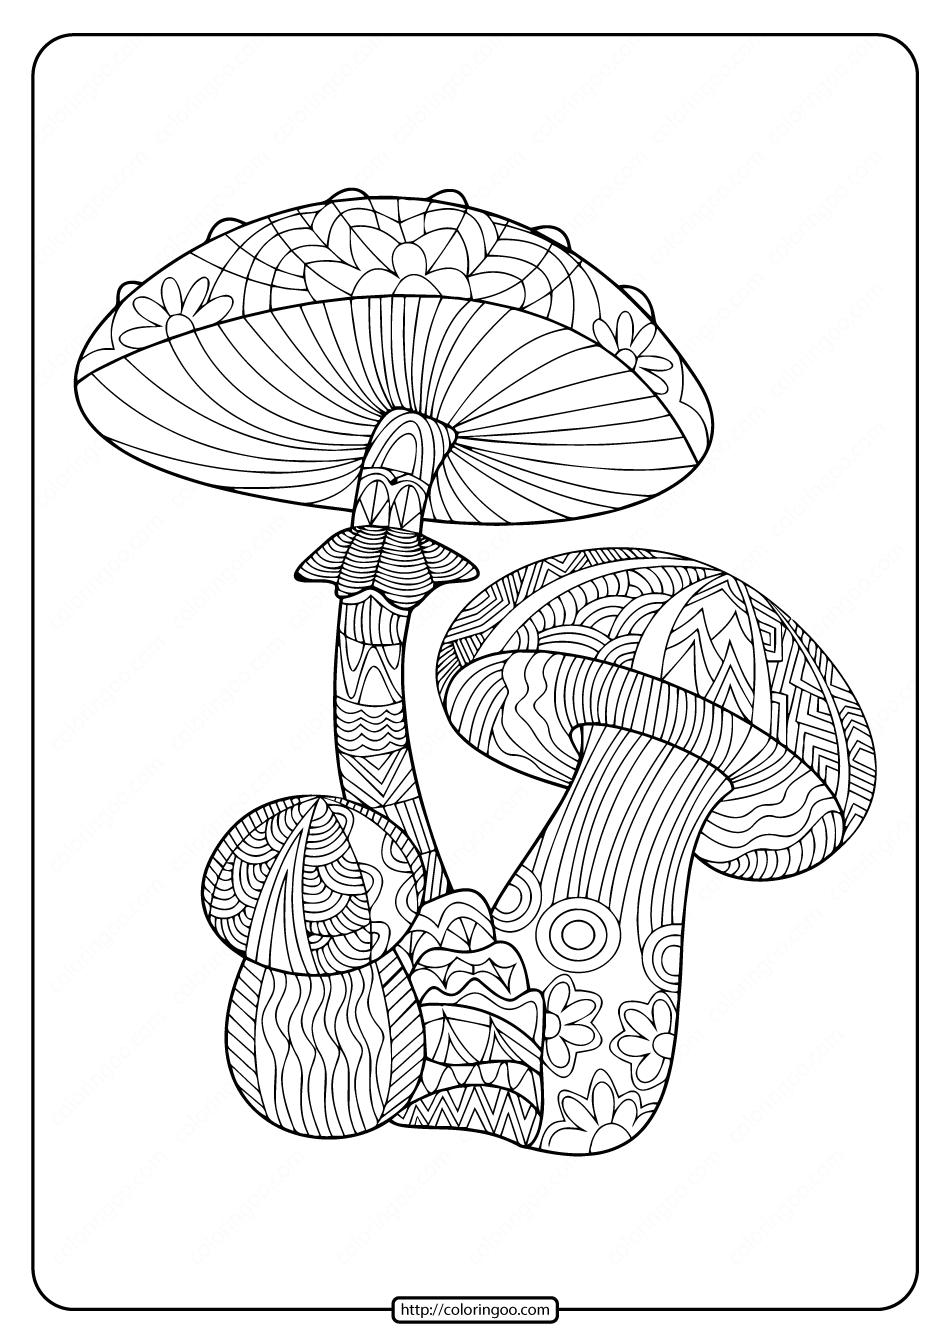 Printable Mushroom Pdf Coloring Pages